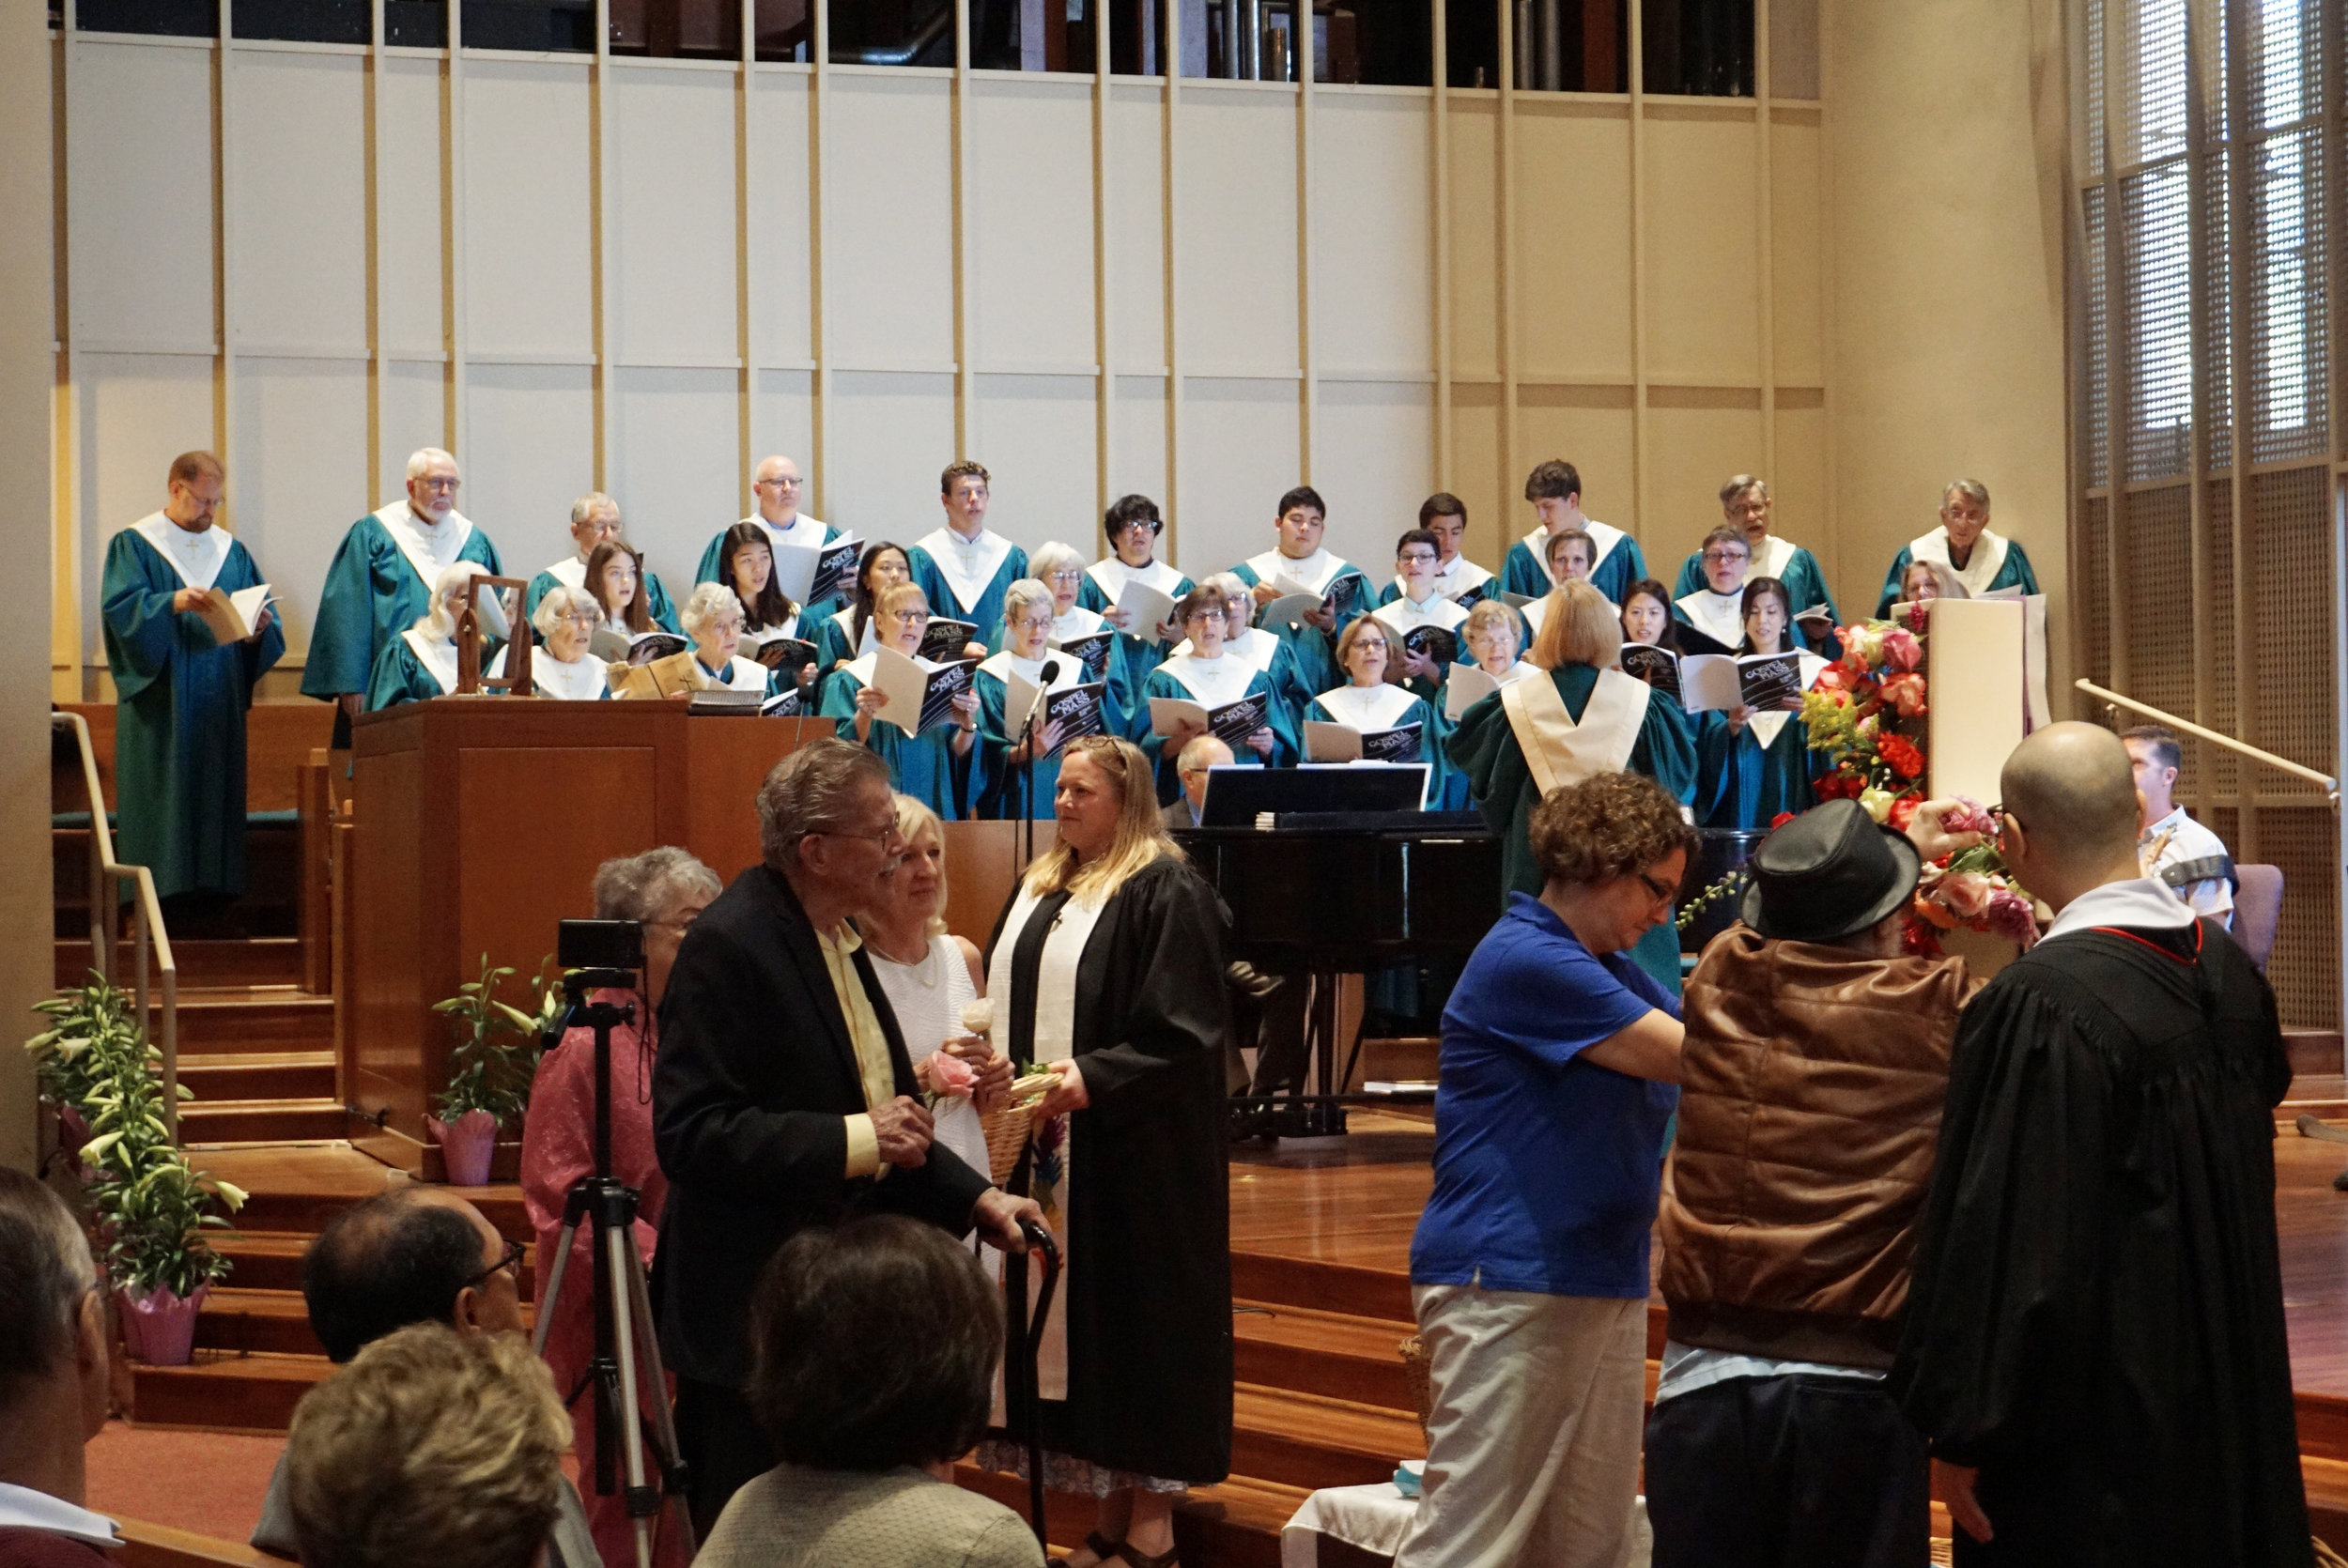 claremont-presbyterian-church-easter-service-2.jpg